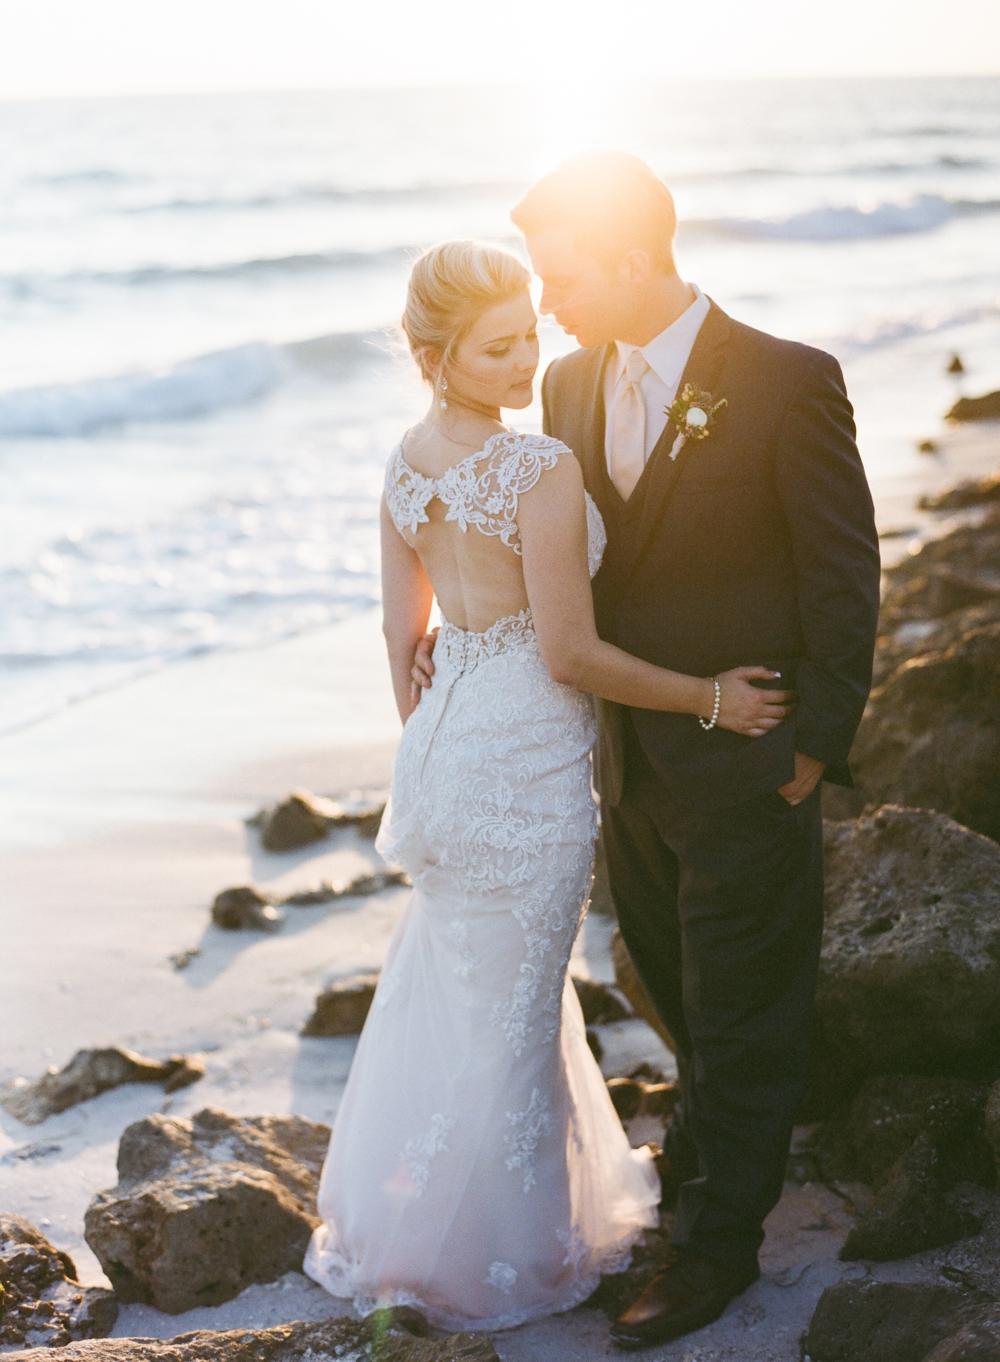 2016 HLM Wedding Beach Shoot 25.jpg